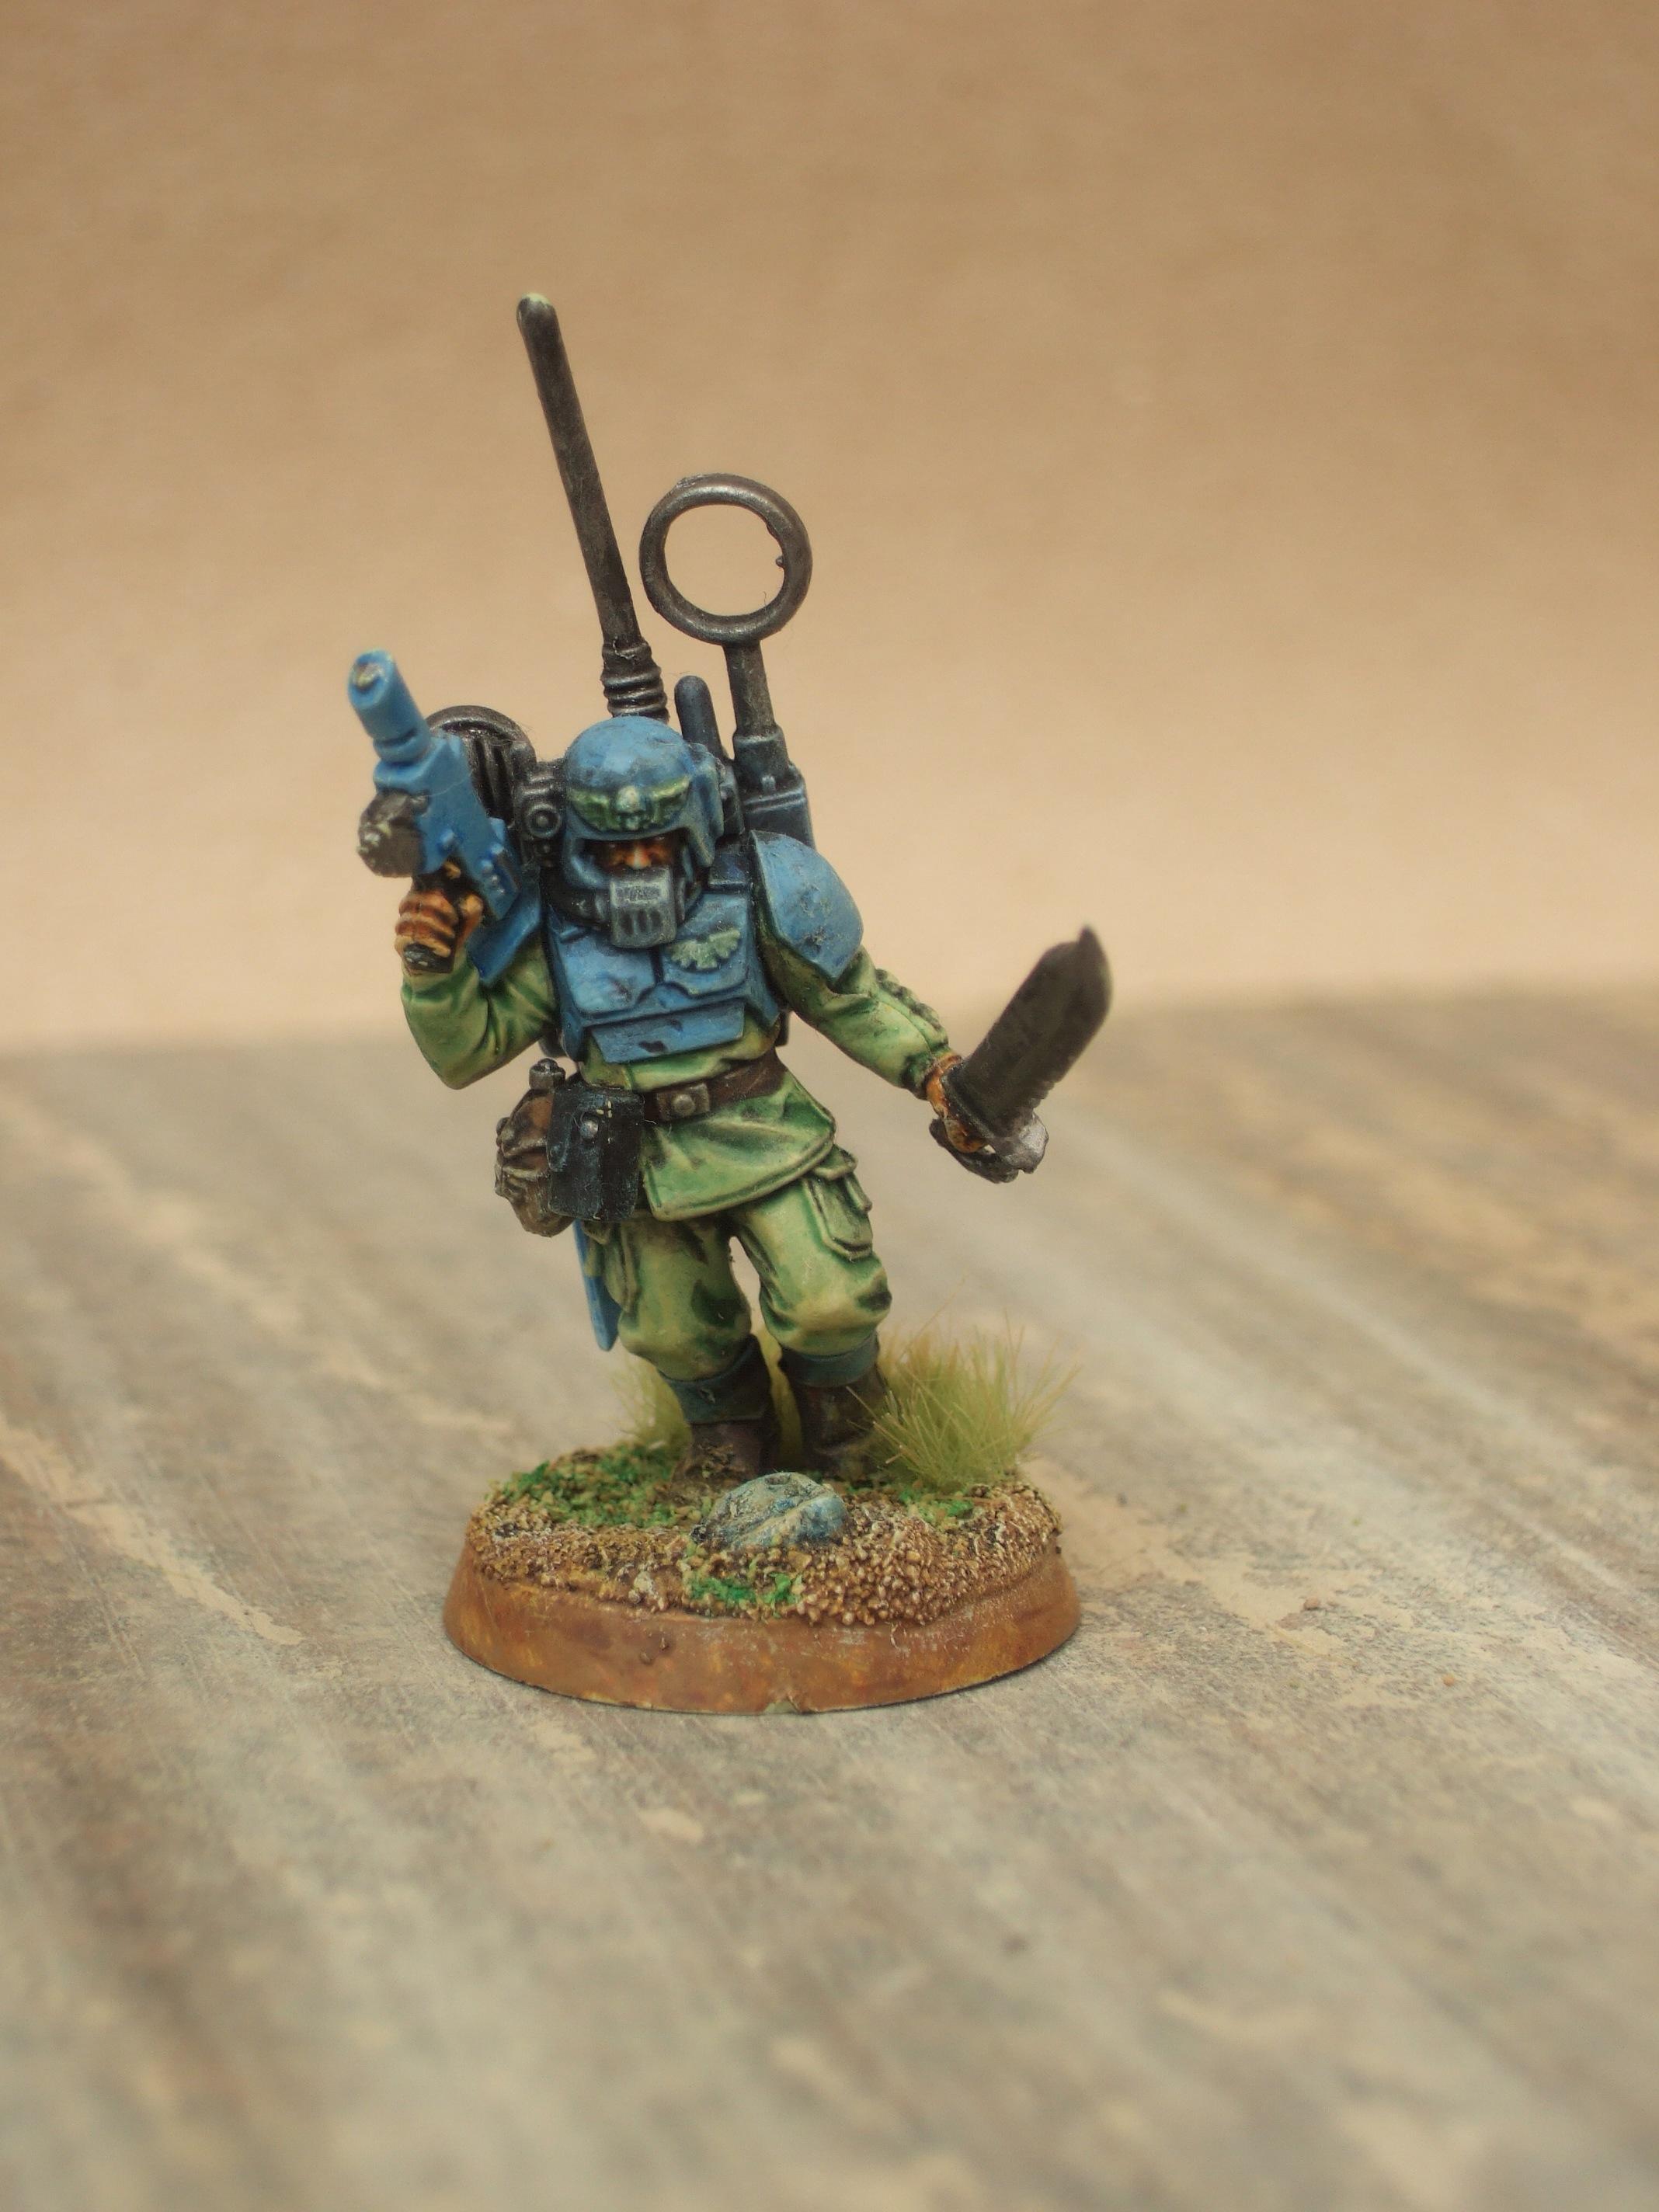 Astra Militarum, Cadians, Imperial Guard, Vox Caster, Warhammer 40,000